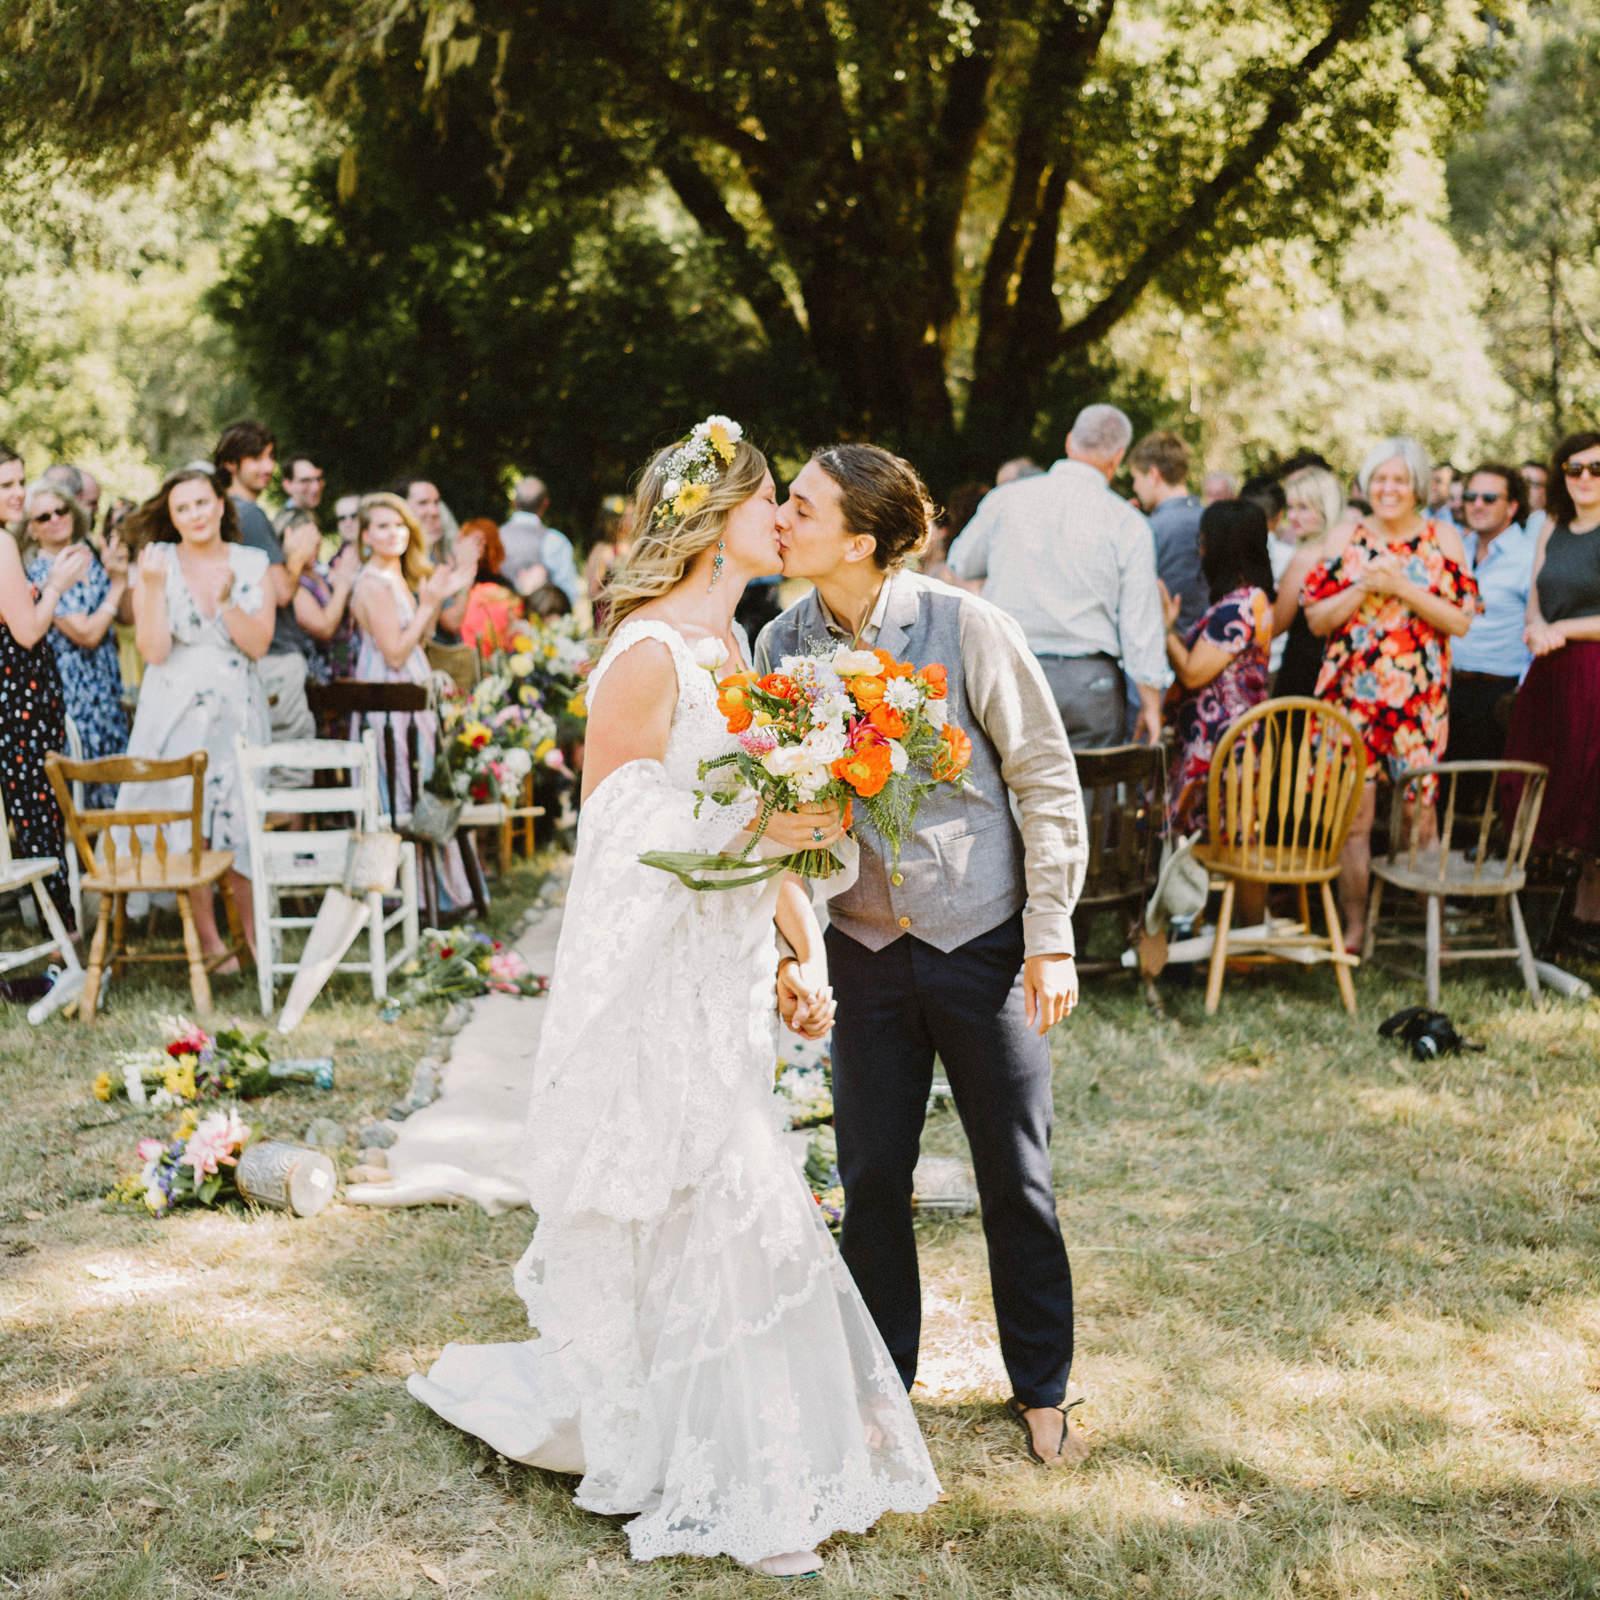 rivers-bend-retreat-wedding-040 RIVER'S BEND RETREAT WEDDING